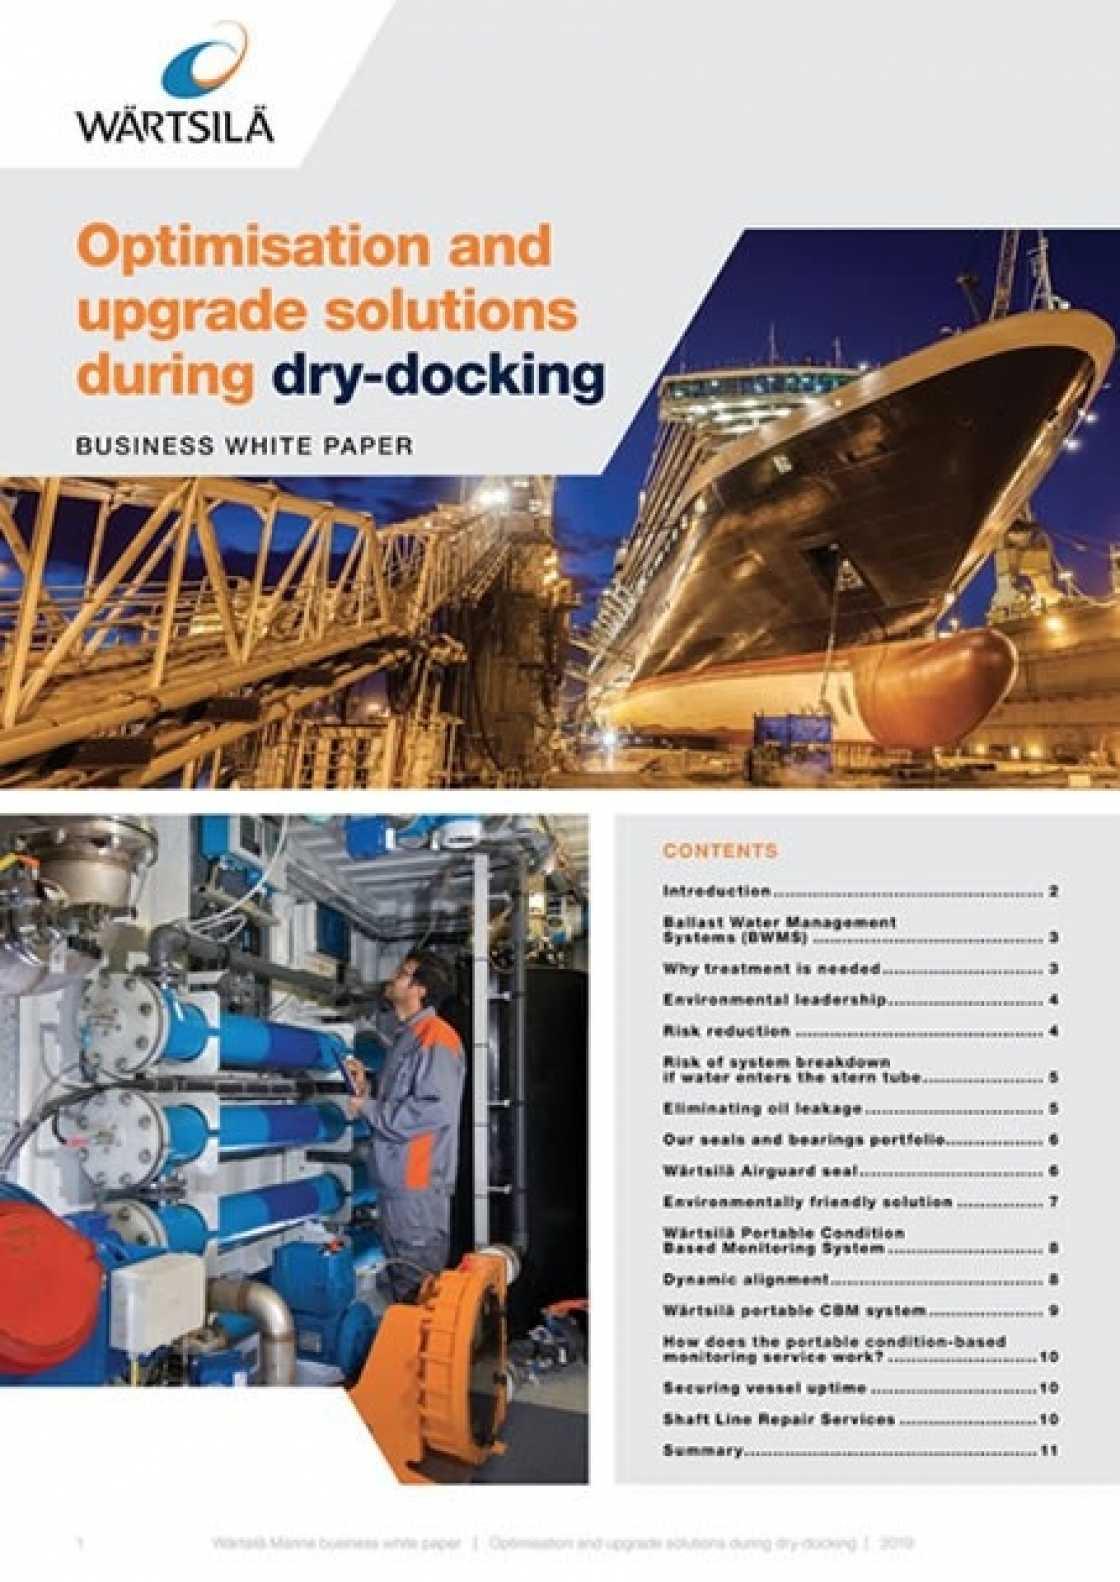 Whitepaper: Optimisation and upgrade solutions during dry-docking - Wärtsilä